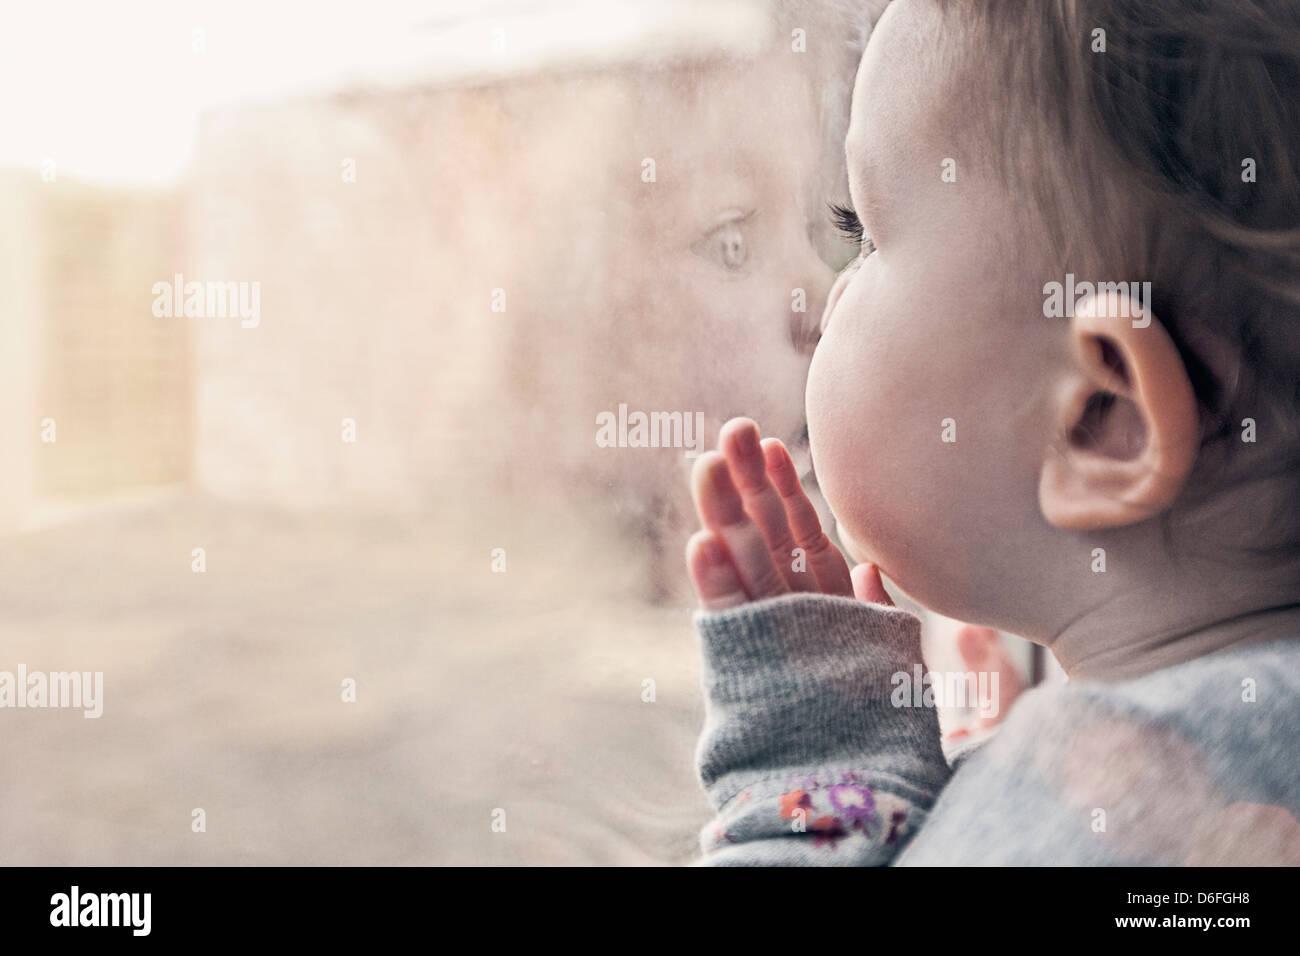 Lindo bebé niña mirando por la ventana Imagen De Stock